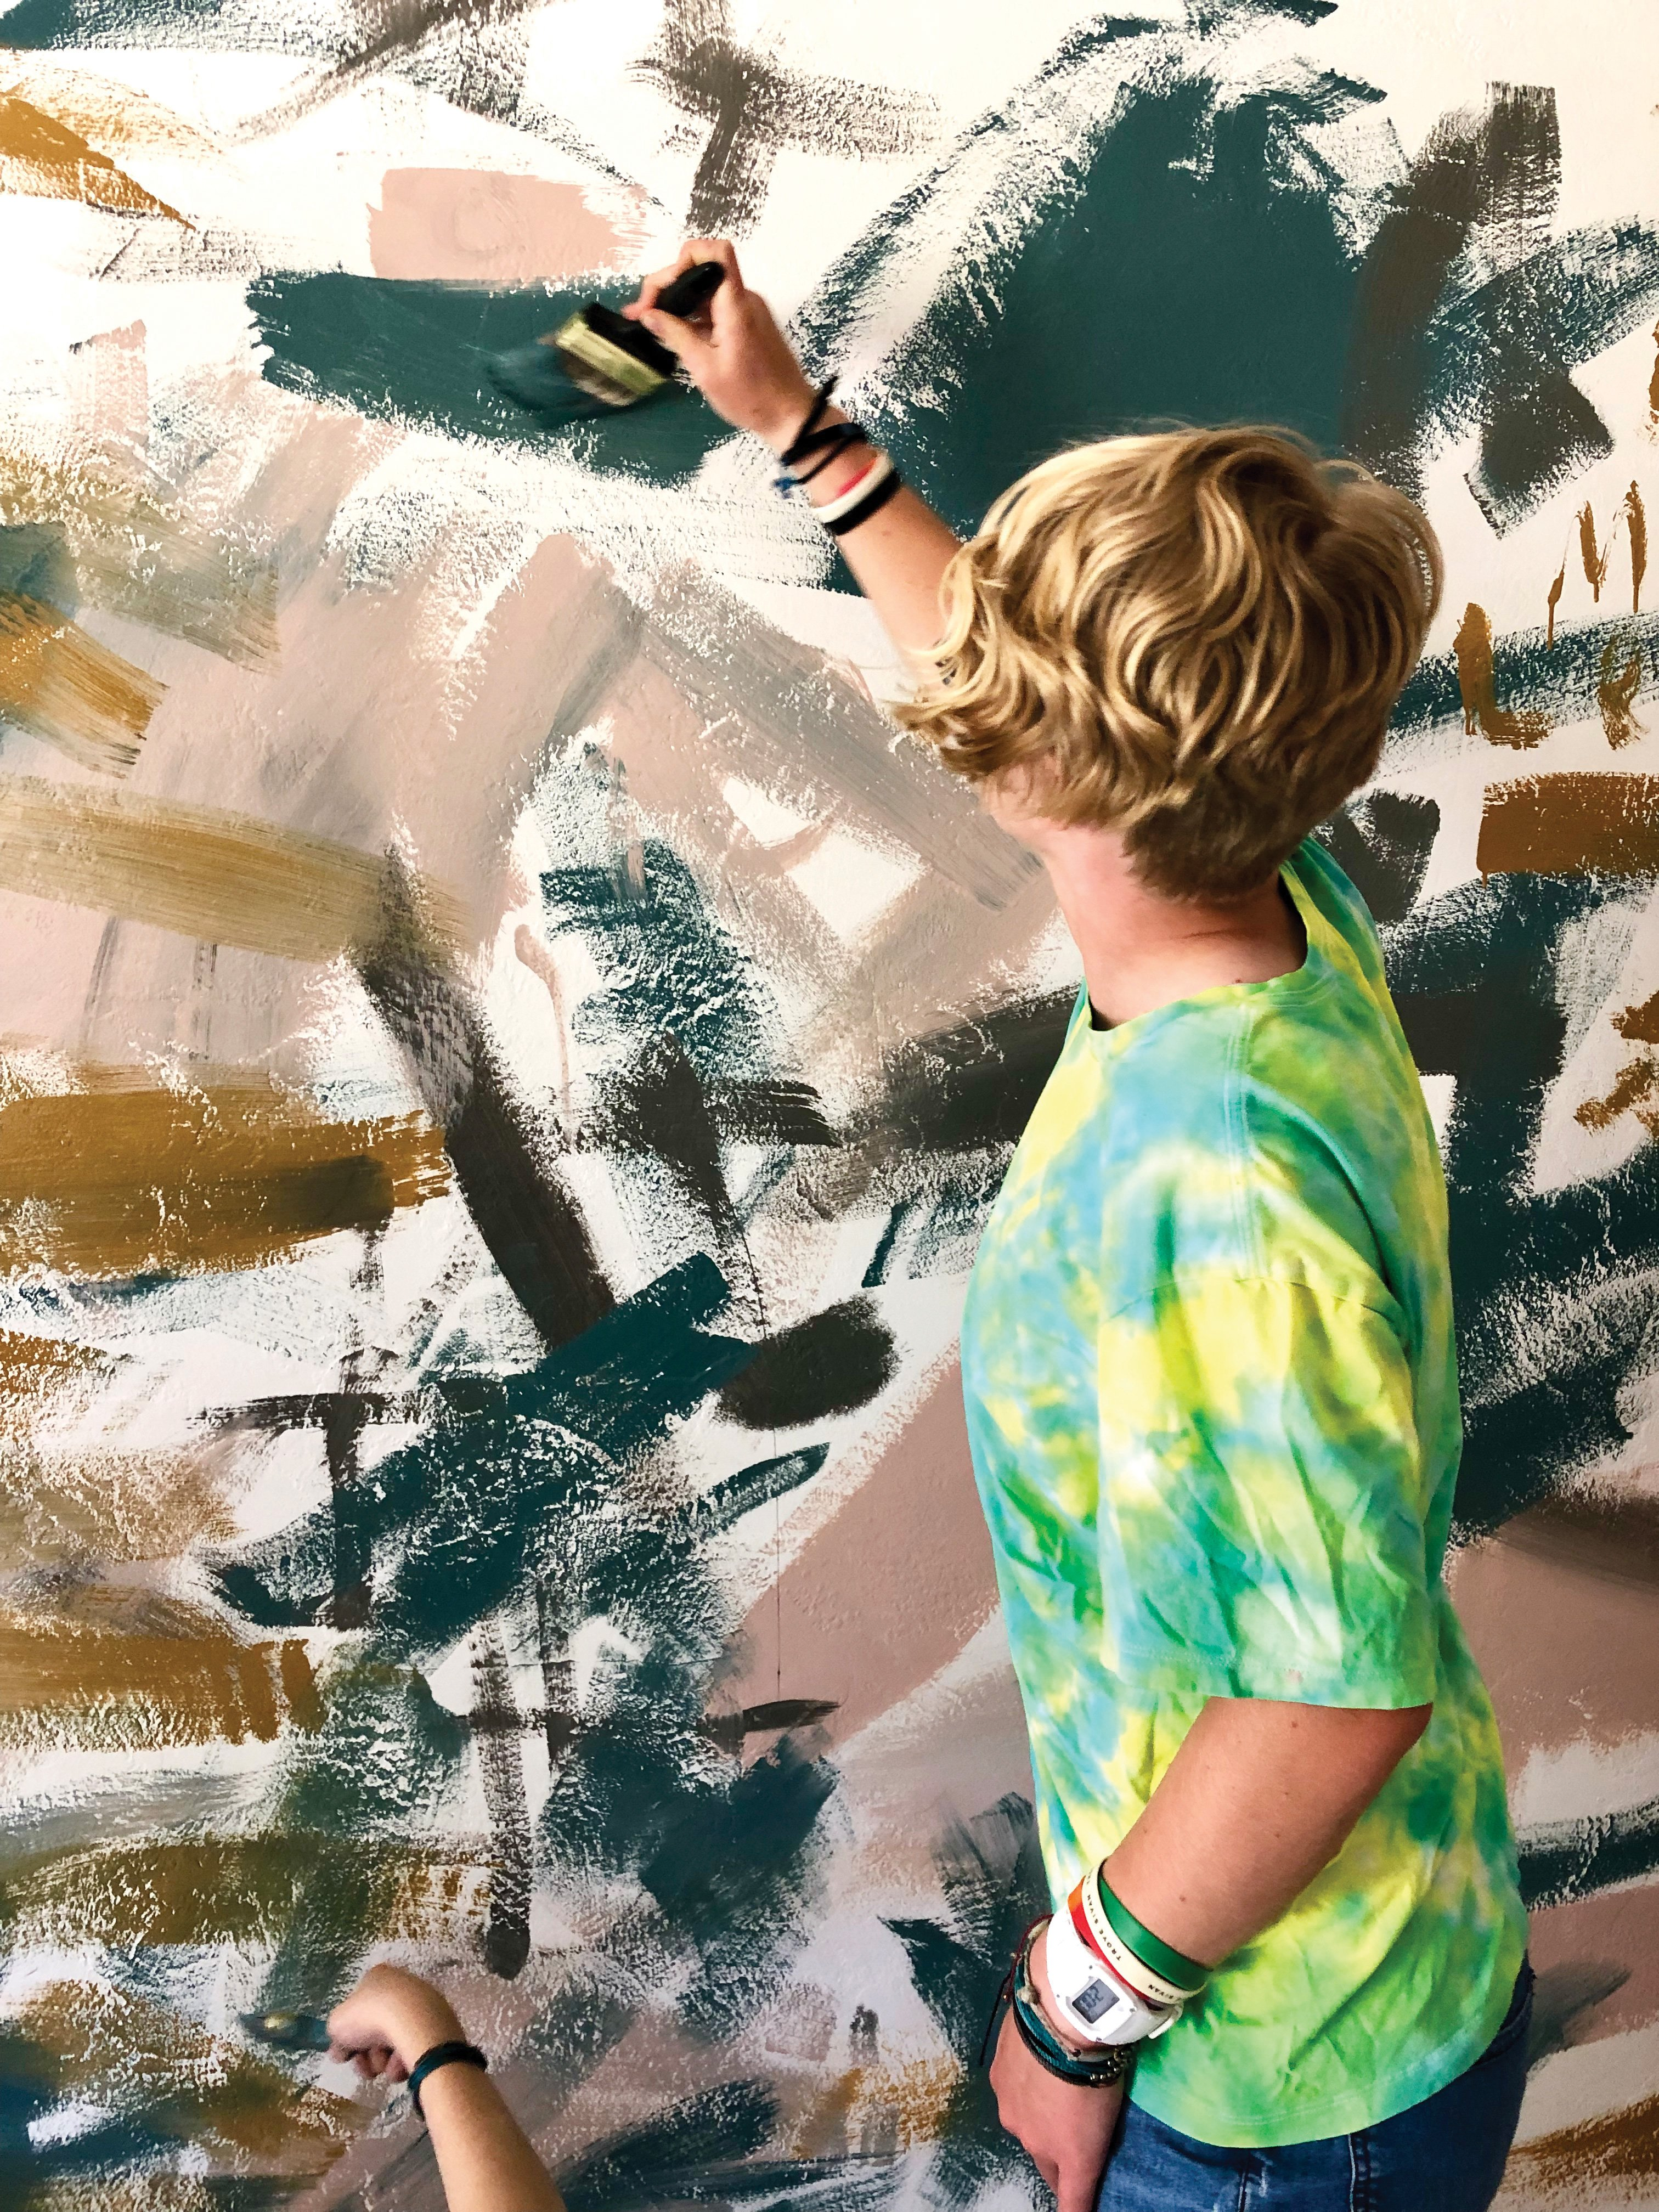 DIY abstract mural kids jennifer mchugh artist san diego contrast colors